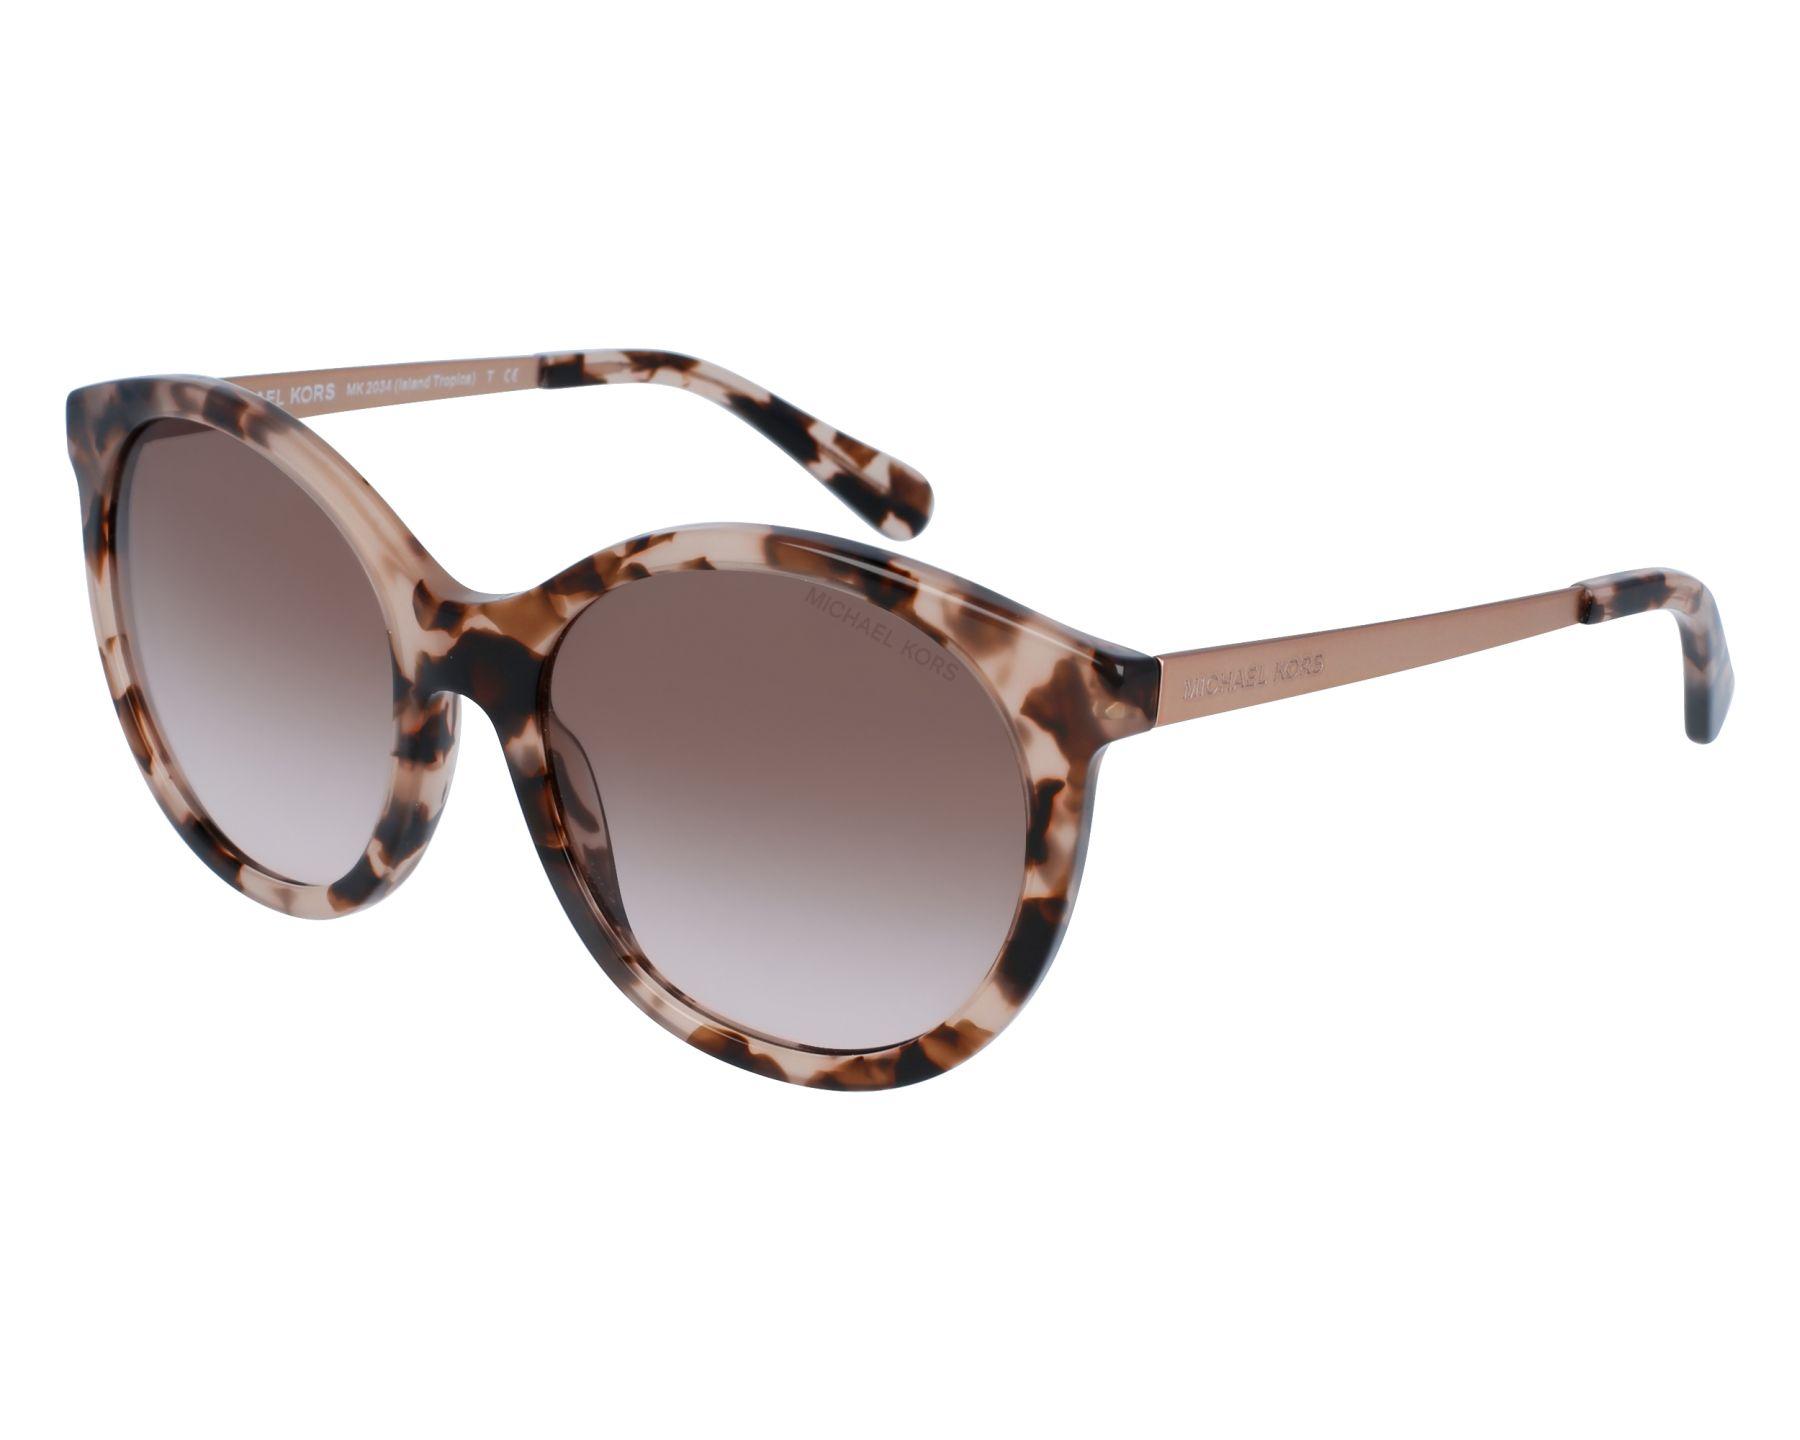 c6fd663c72 Sunglasses Michael Kors MK-2034 320513 55-18 Brown Lila front view